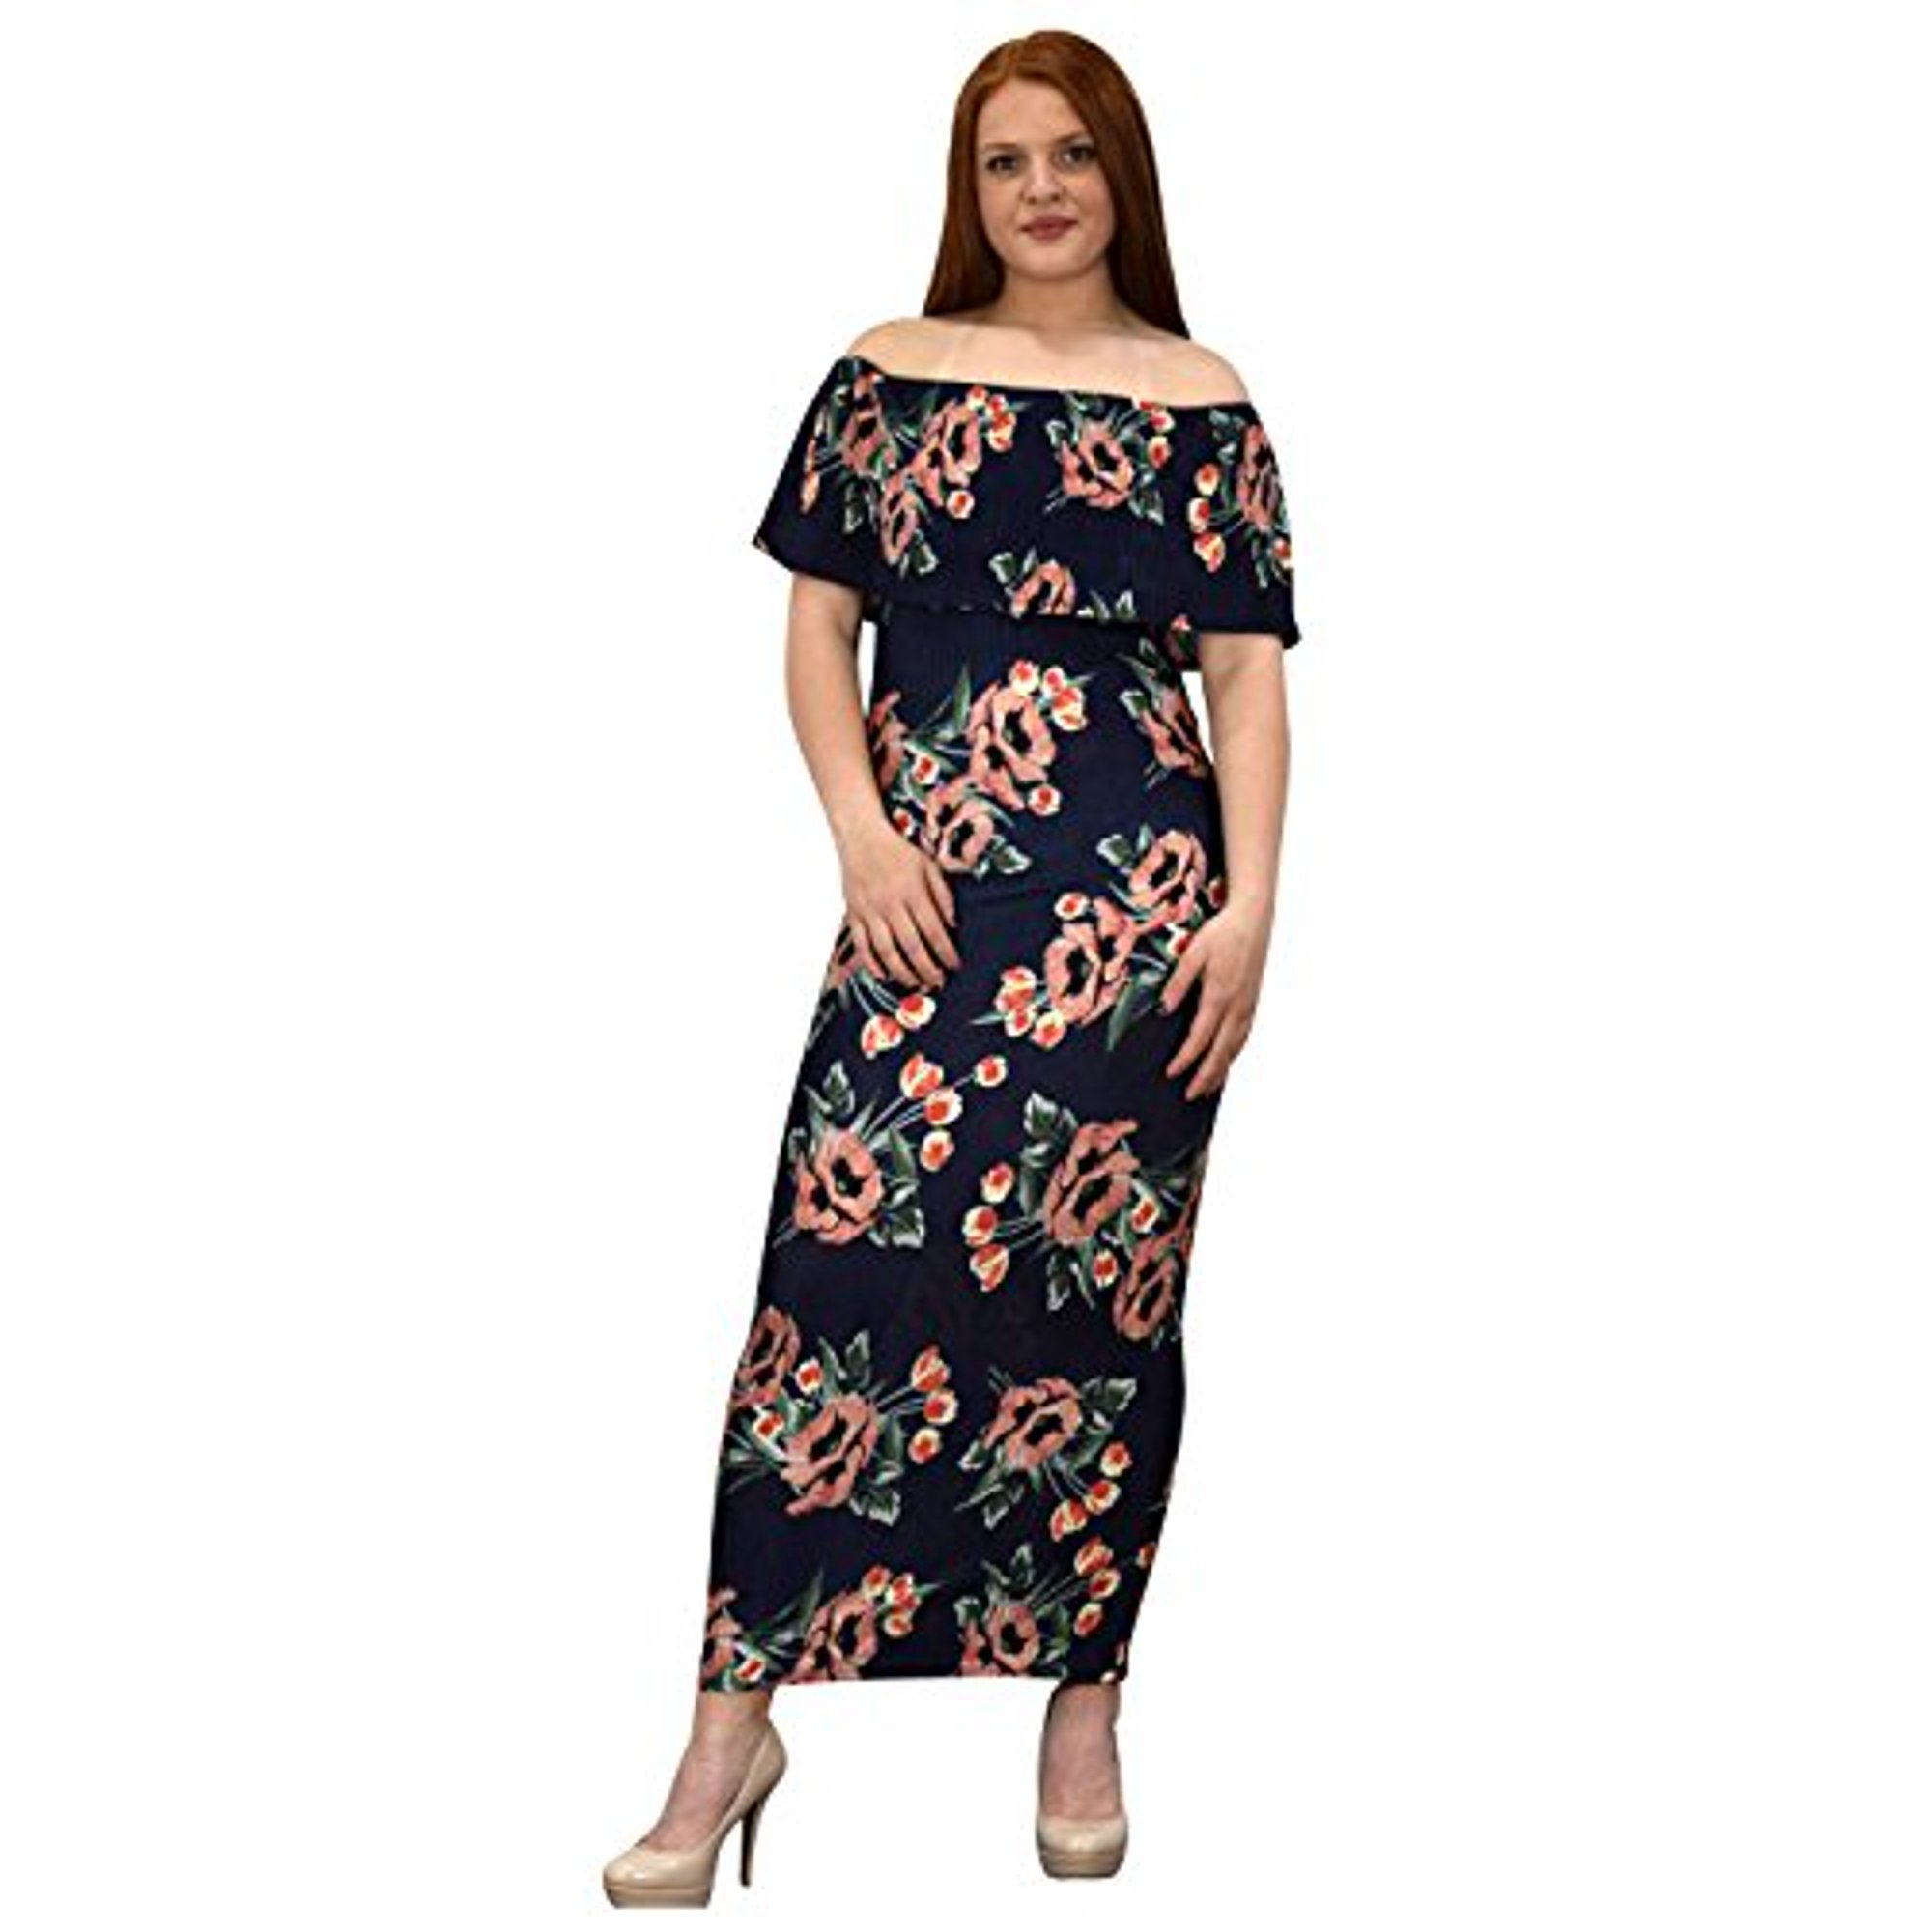 dd57213368 Peach Couture Womens Summer Gypsy Bohemian Vintage Floral Long Maxi ...